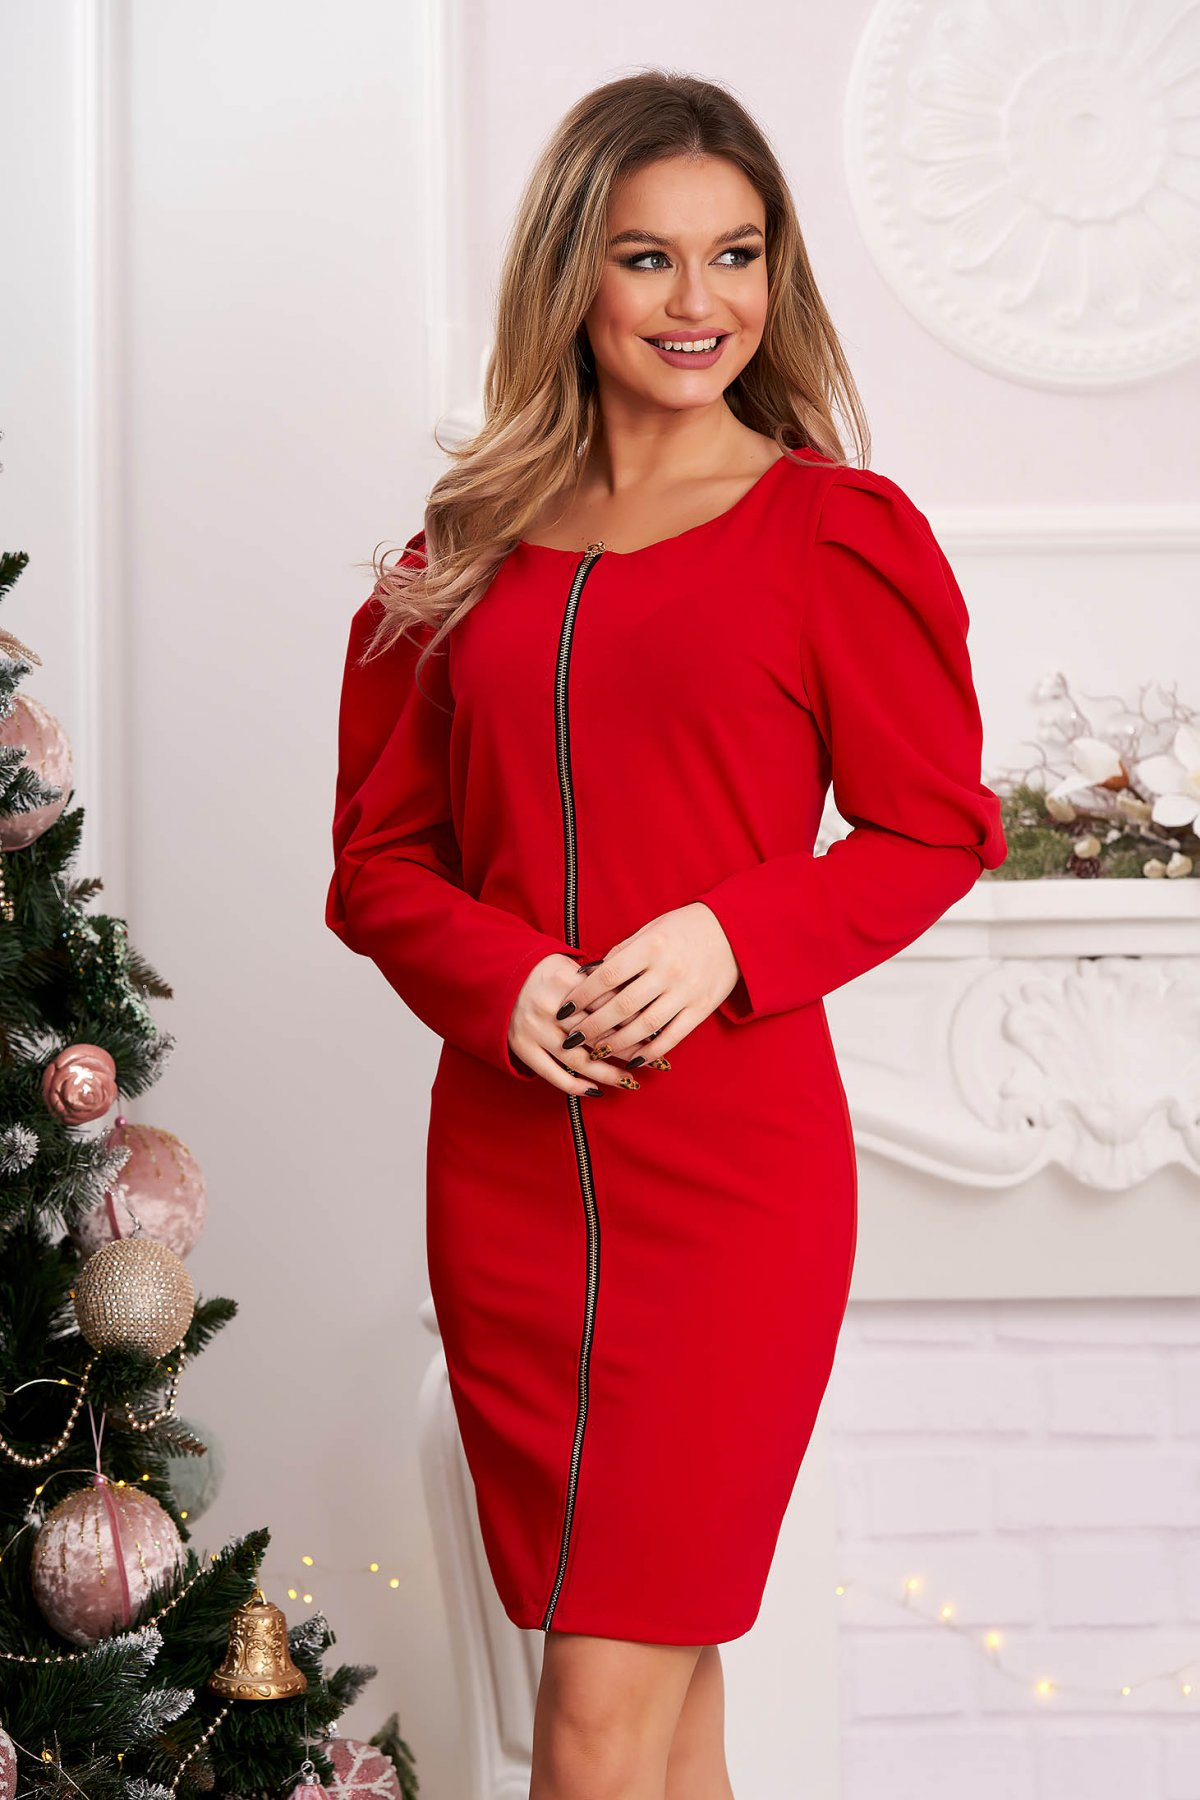 Rochie rosie scurta din material usor elastic cu croi larg si umeri cu volum